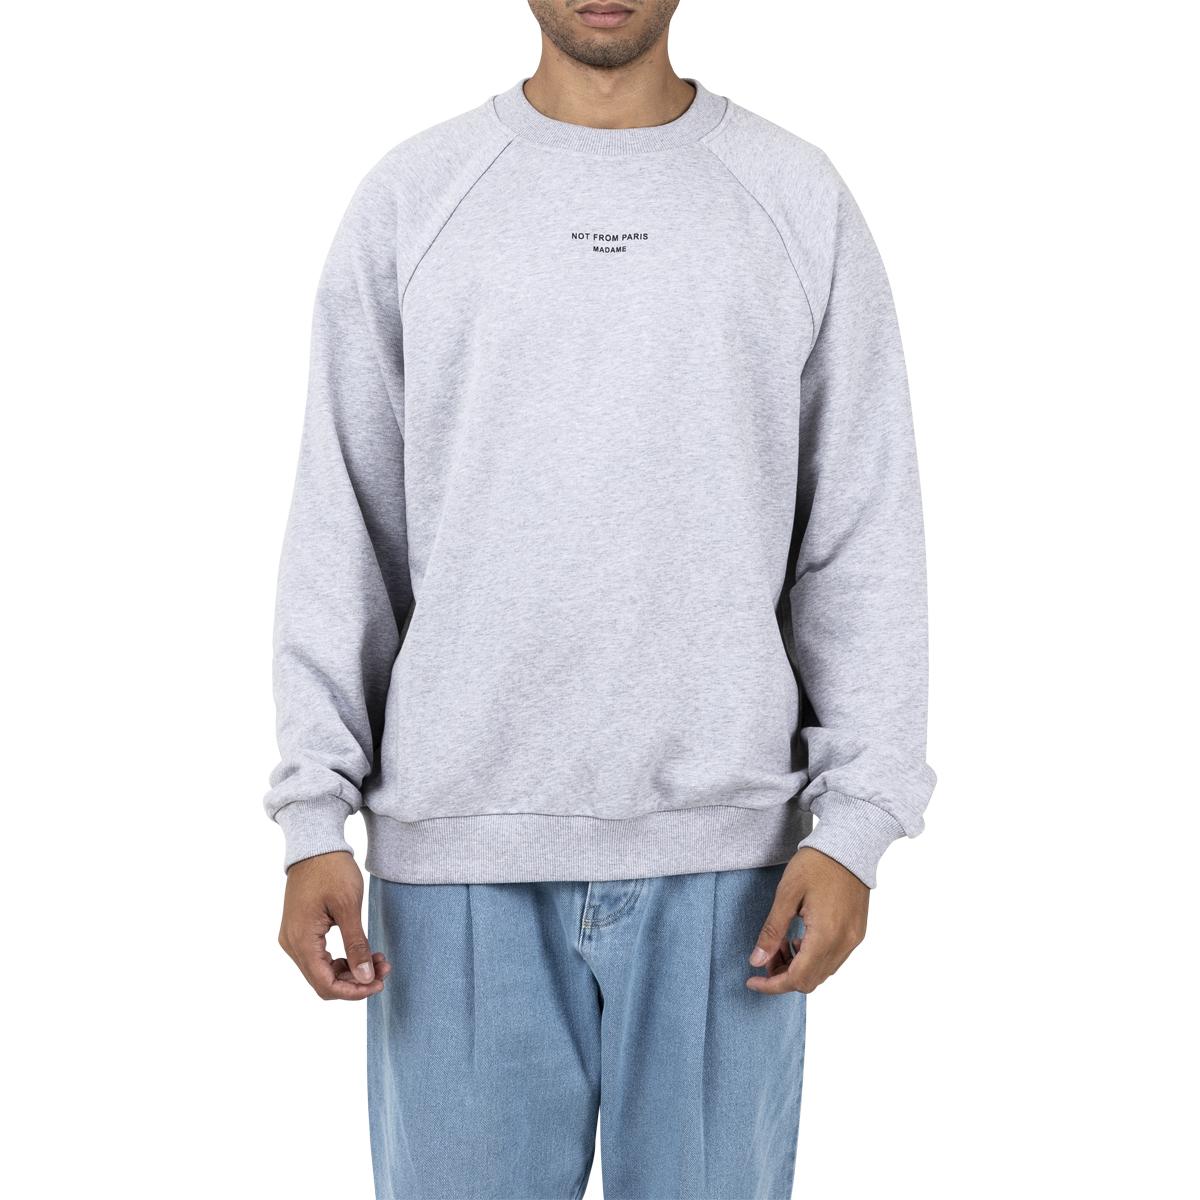 Drôle De Monsieur Raglan NFPM Sweatshirt